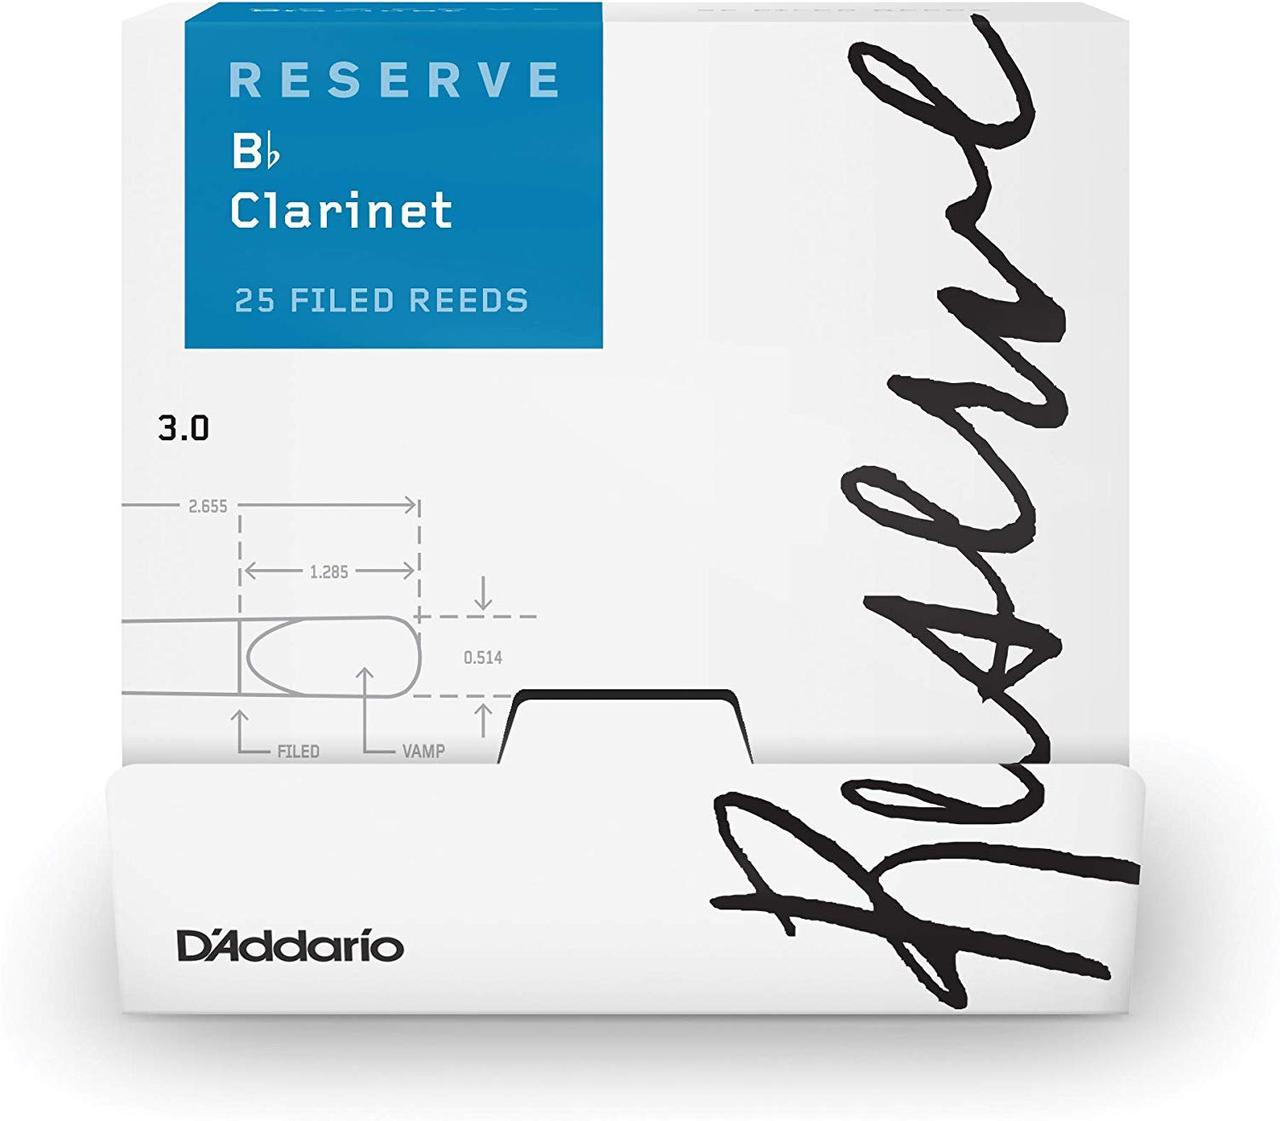 D`ADDARIO Reserve Bb Clarinet #3.0 - 25 Pack Трости для кларнета (DCR0130-B25)